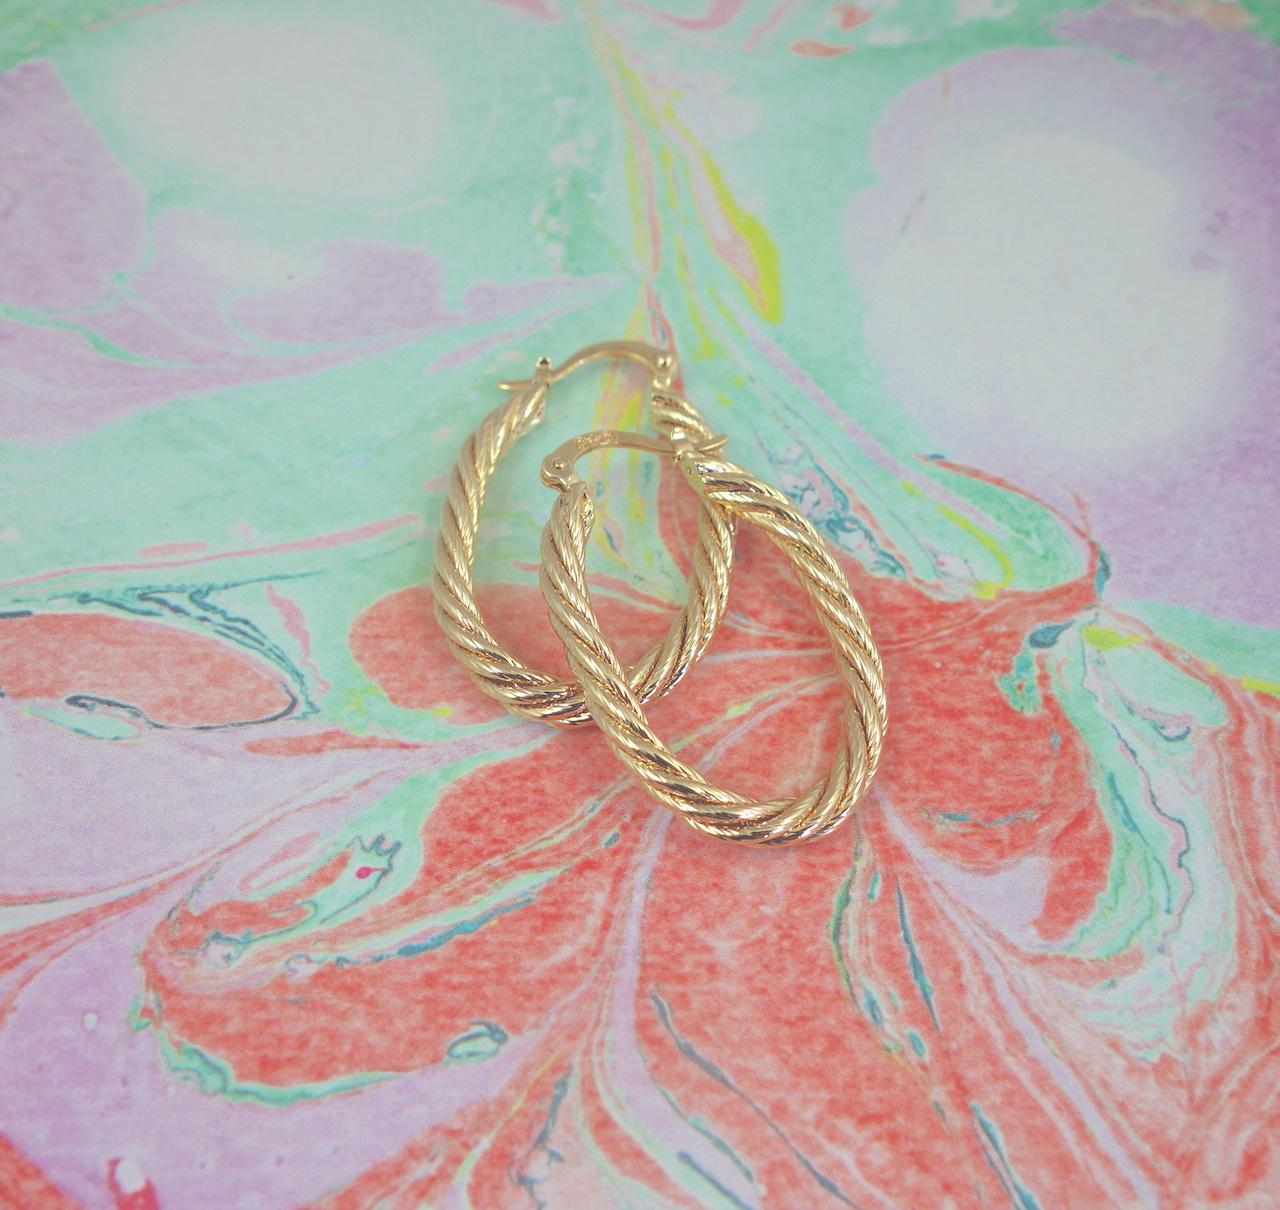 Boucles-oreilles-luisa-Roulotte-plaque-or-vintage-retro-intemporel-torsade-ovale-creoles-precieuses